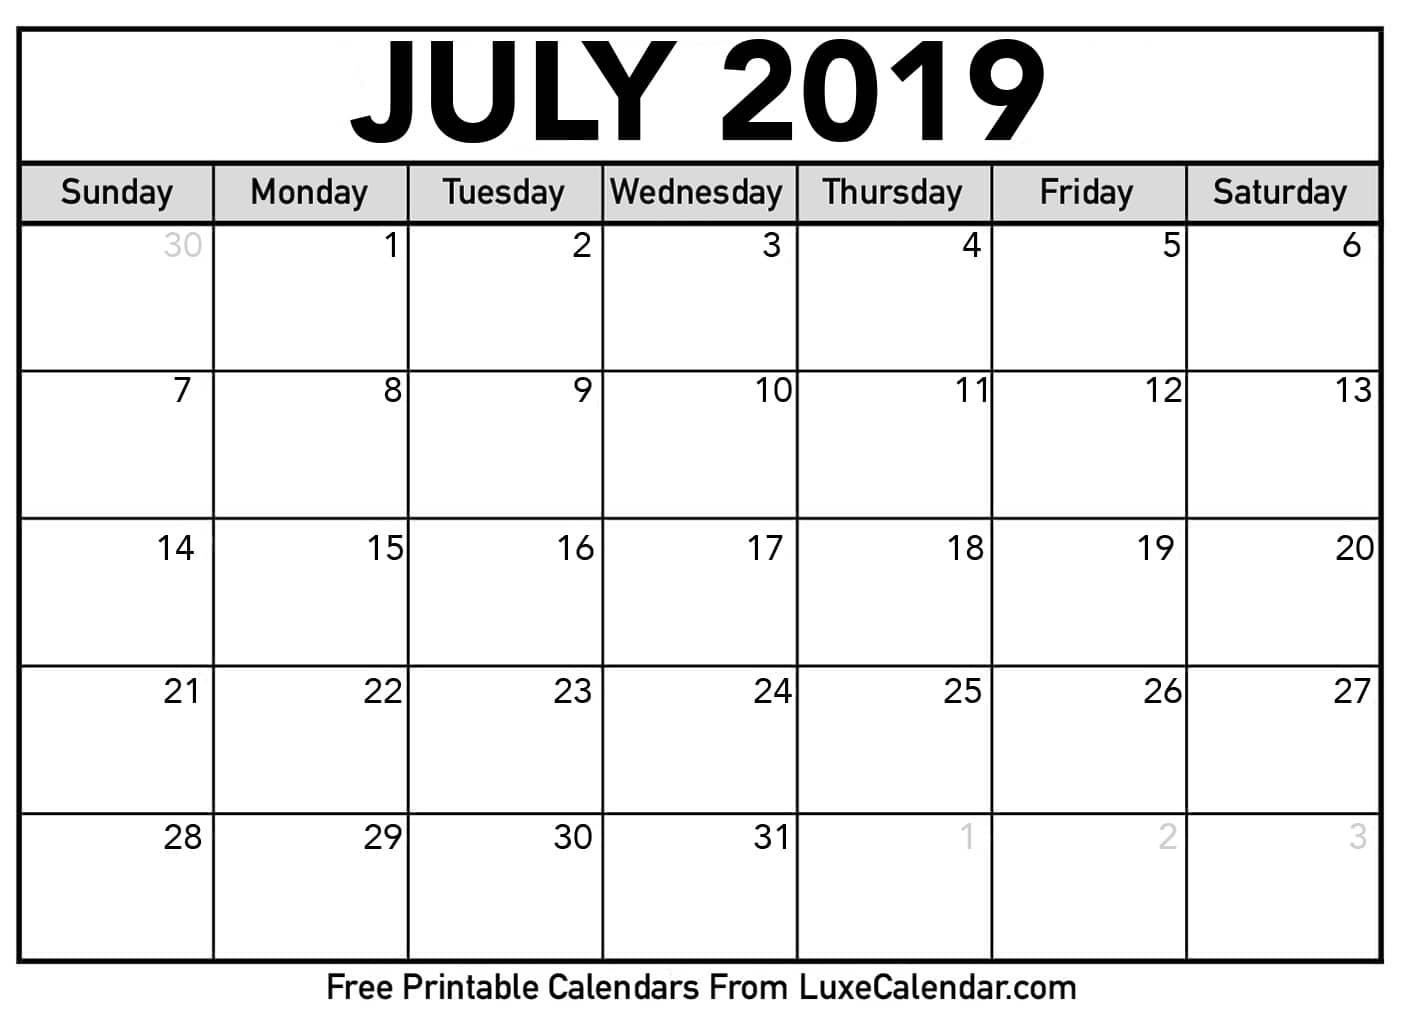 Free Printable Calendar Of June 2019 Blank Templates Word in June And July Blank Calendar